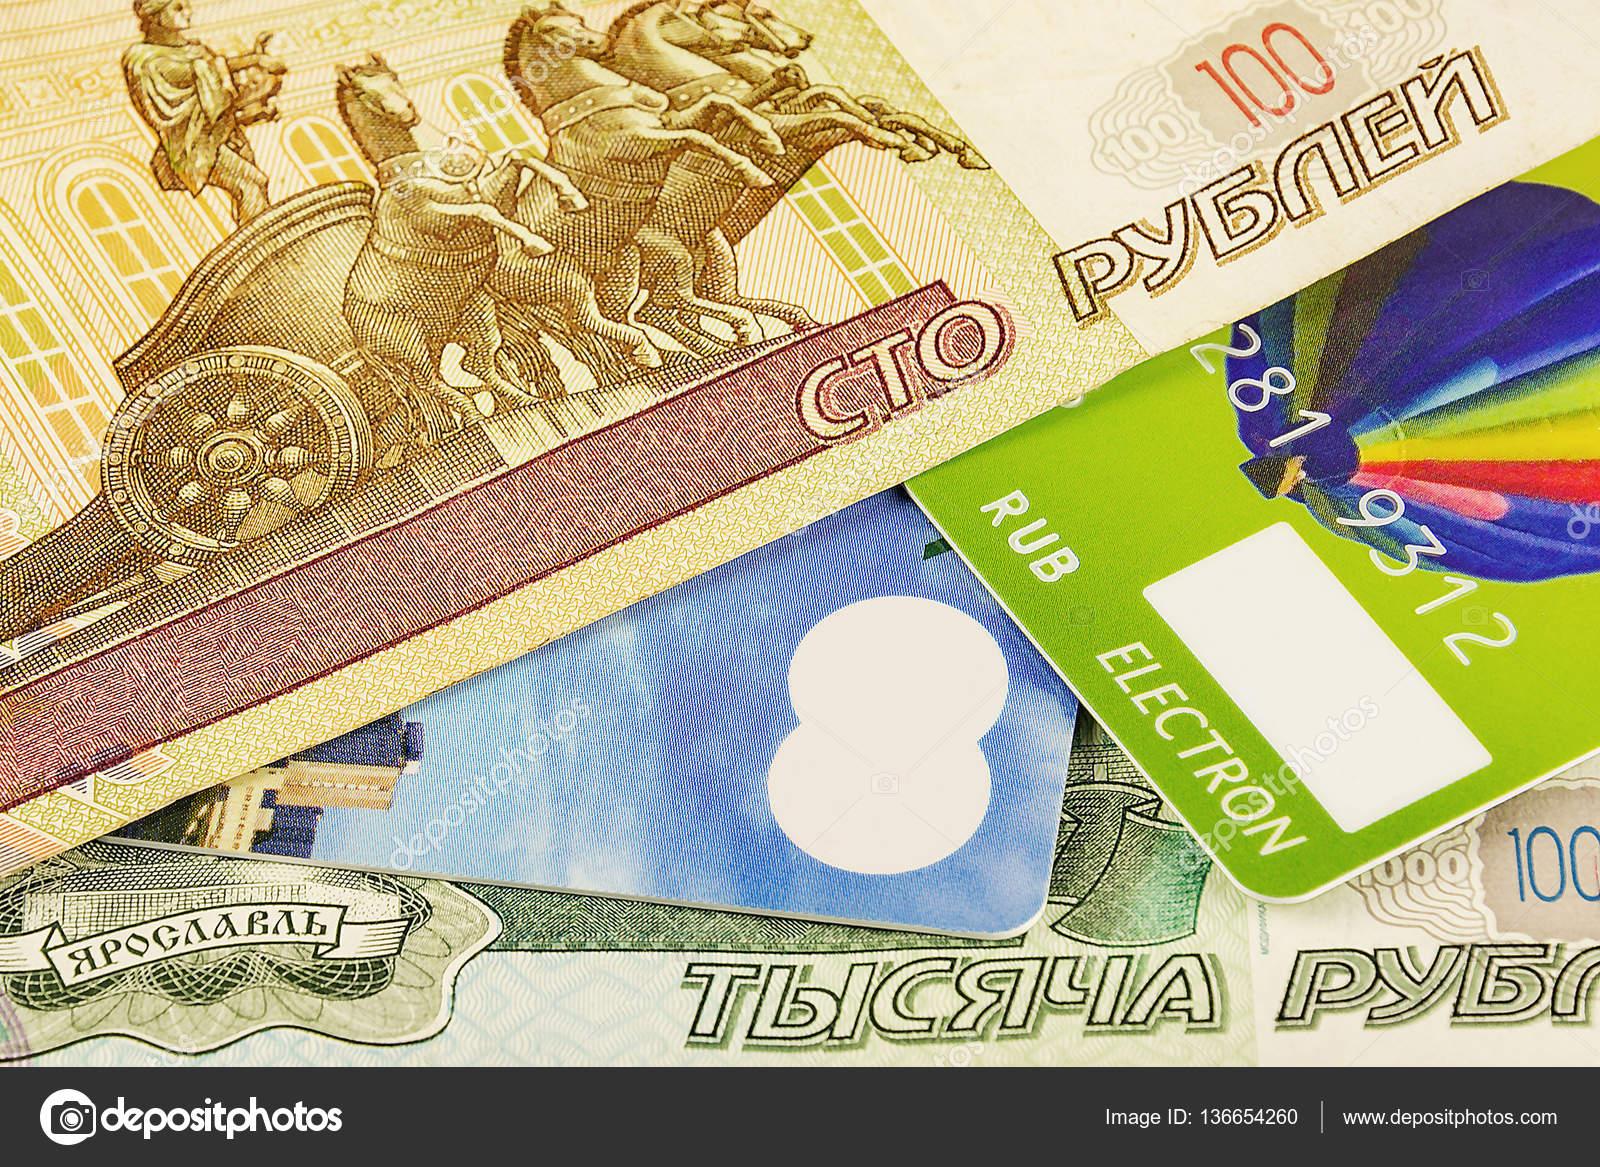 https://st3.depositphotos.com/7507140/13665/i/1600/depositphotos_136654260-stock-photo-part-of-the-bank-card.jpg